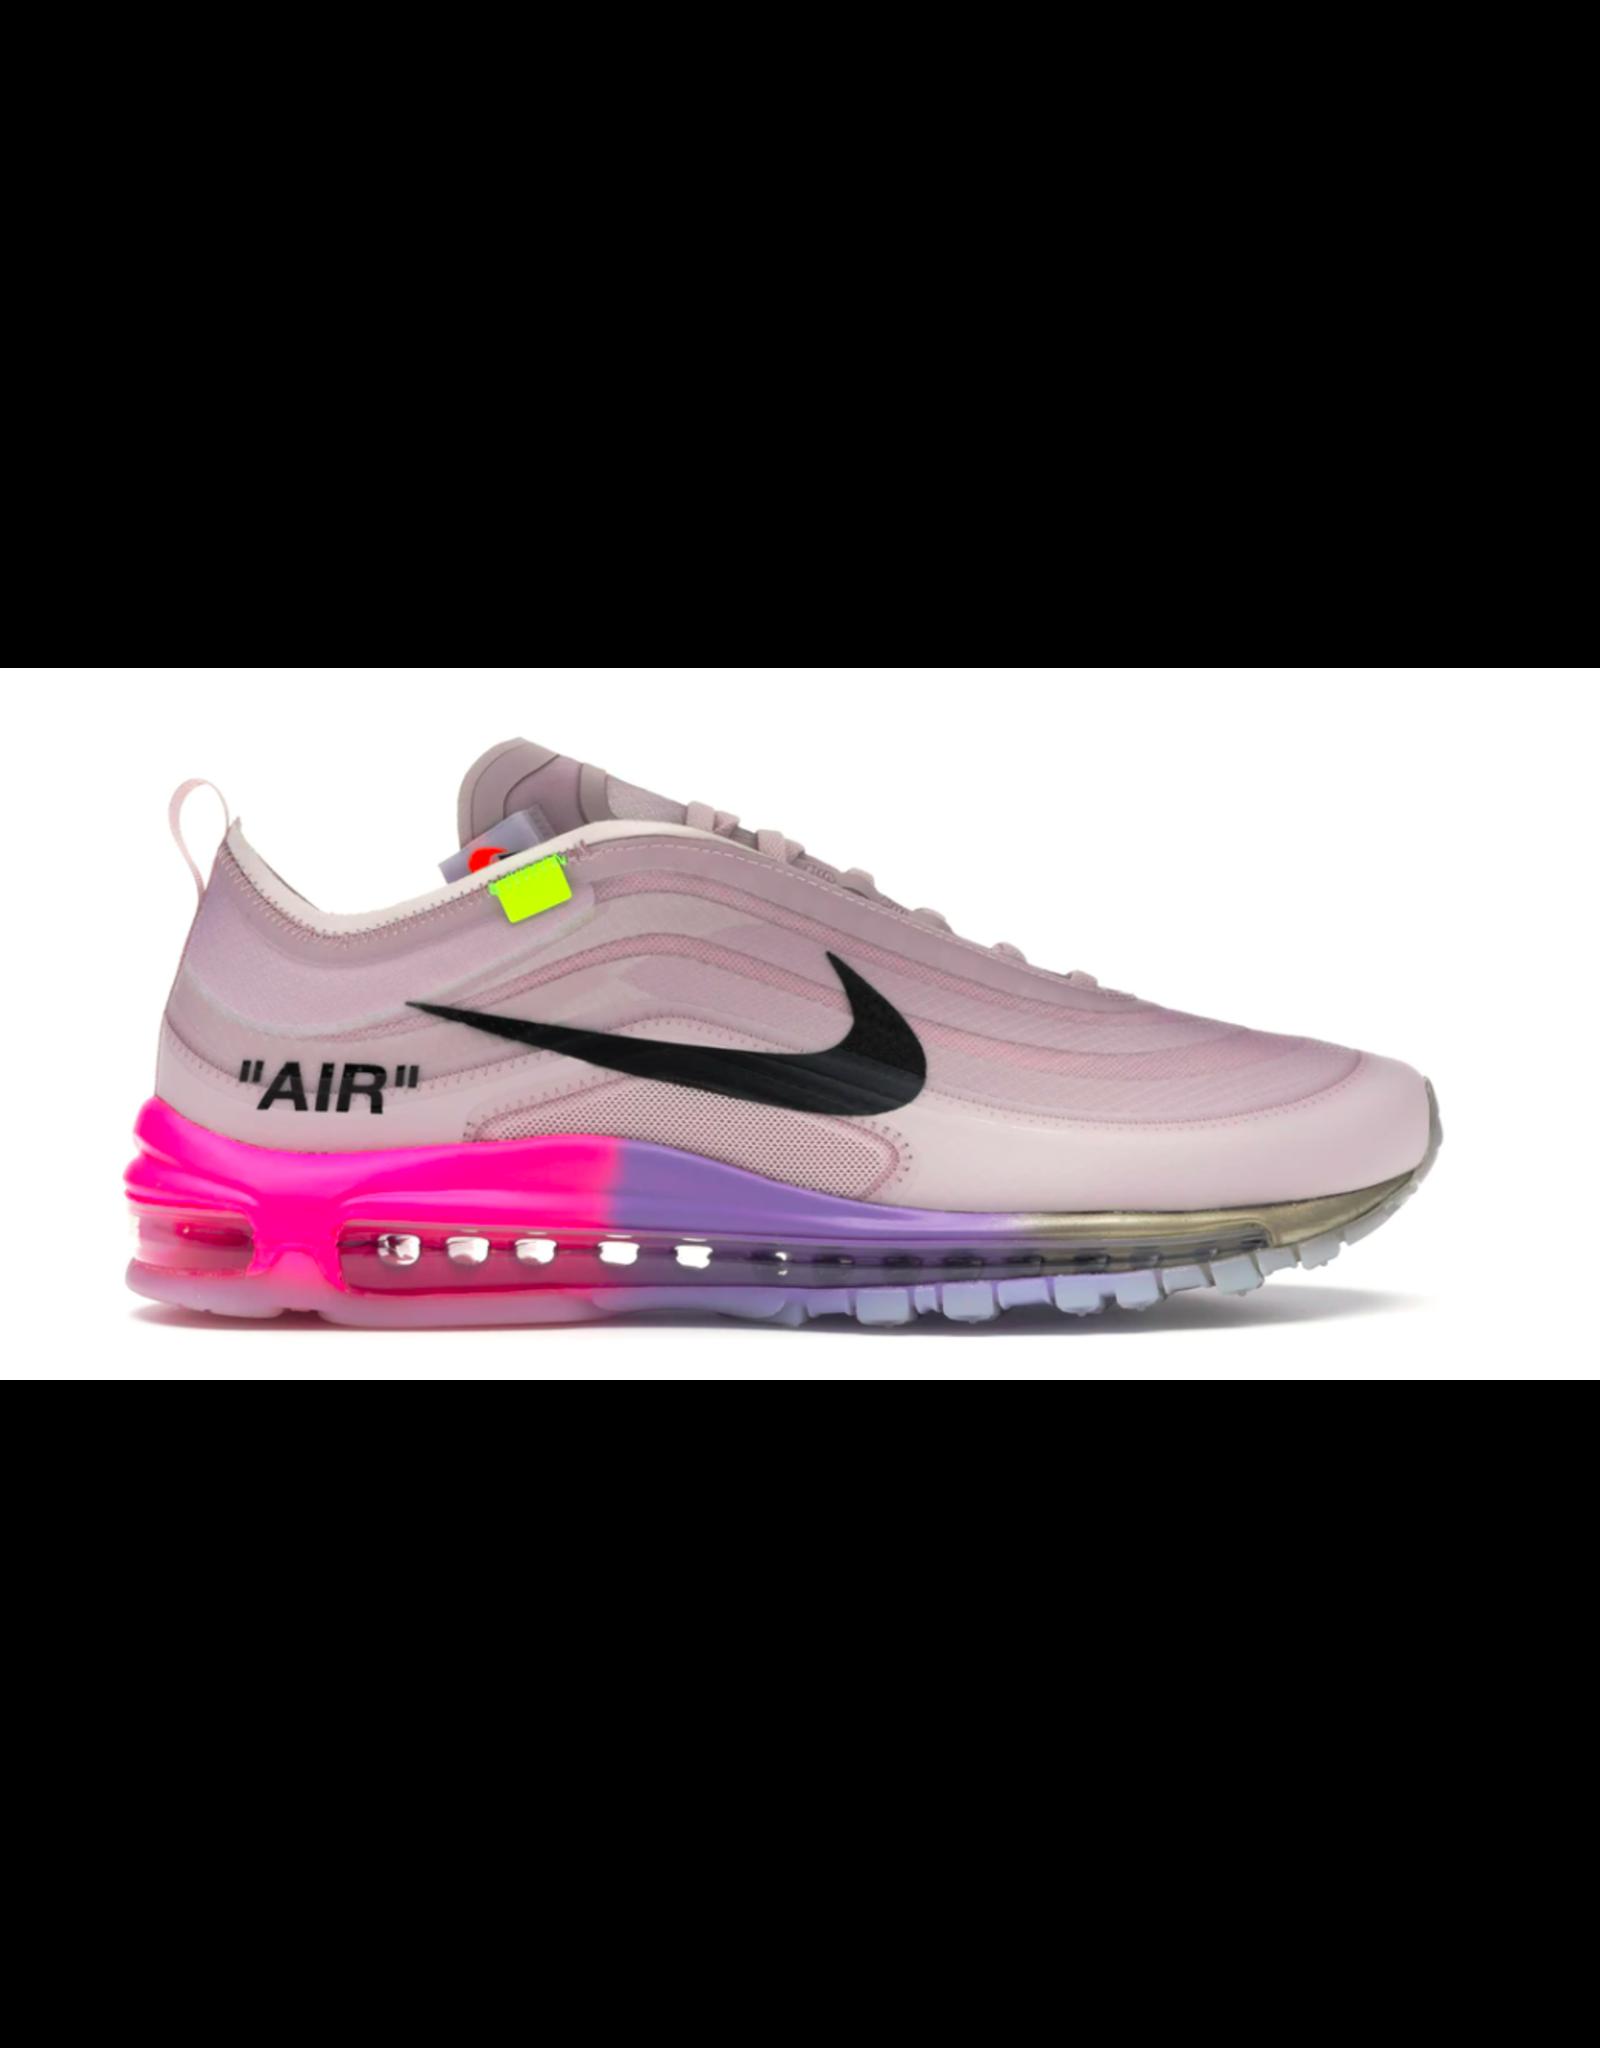 "NIKE Nike Air Max 97 Off-White Elemental Rose Serena ""Queen"""